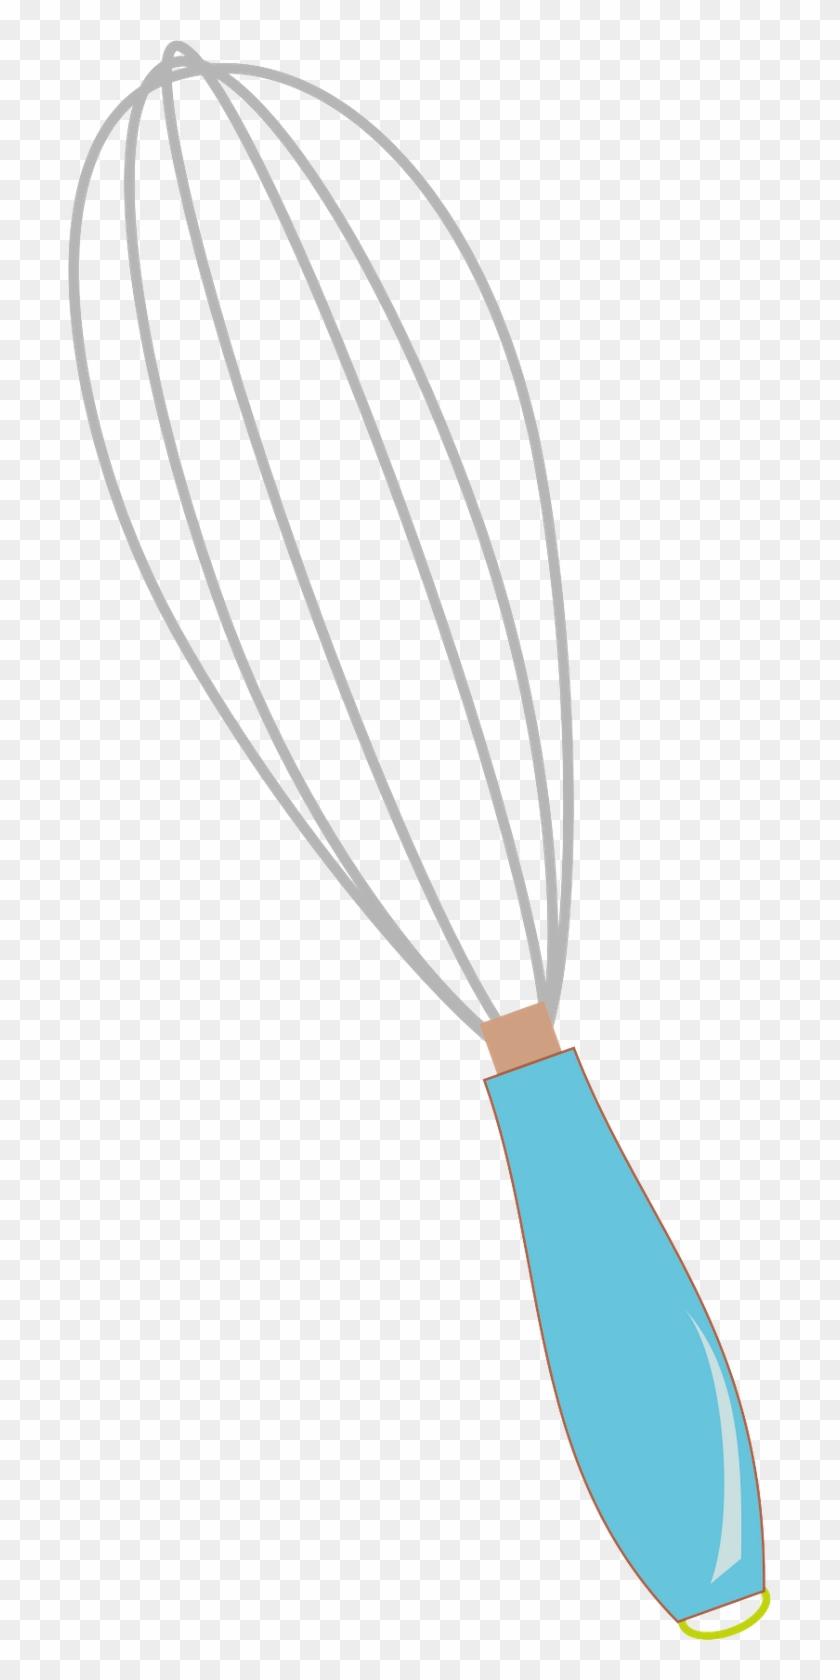 spoon clipart mixer baking spoon clip art png download 498954 pikpng spoon clipart mixer baking spoon clip